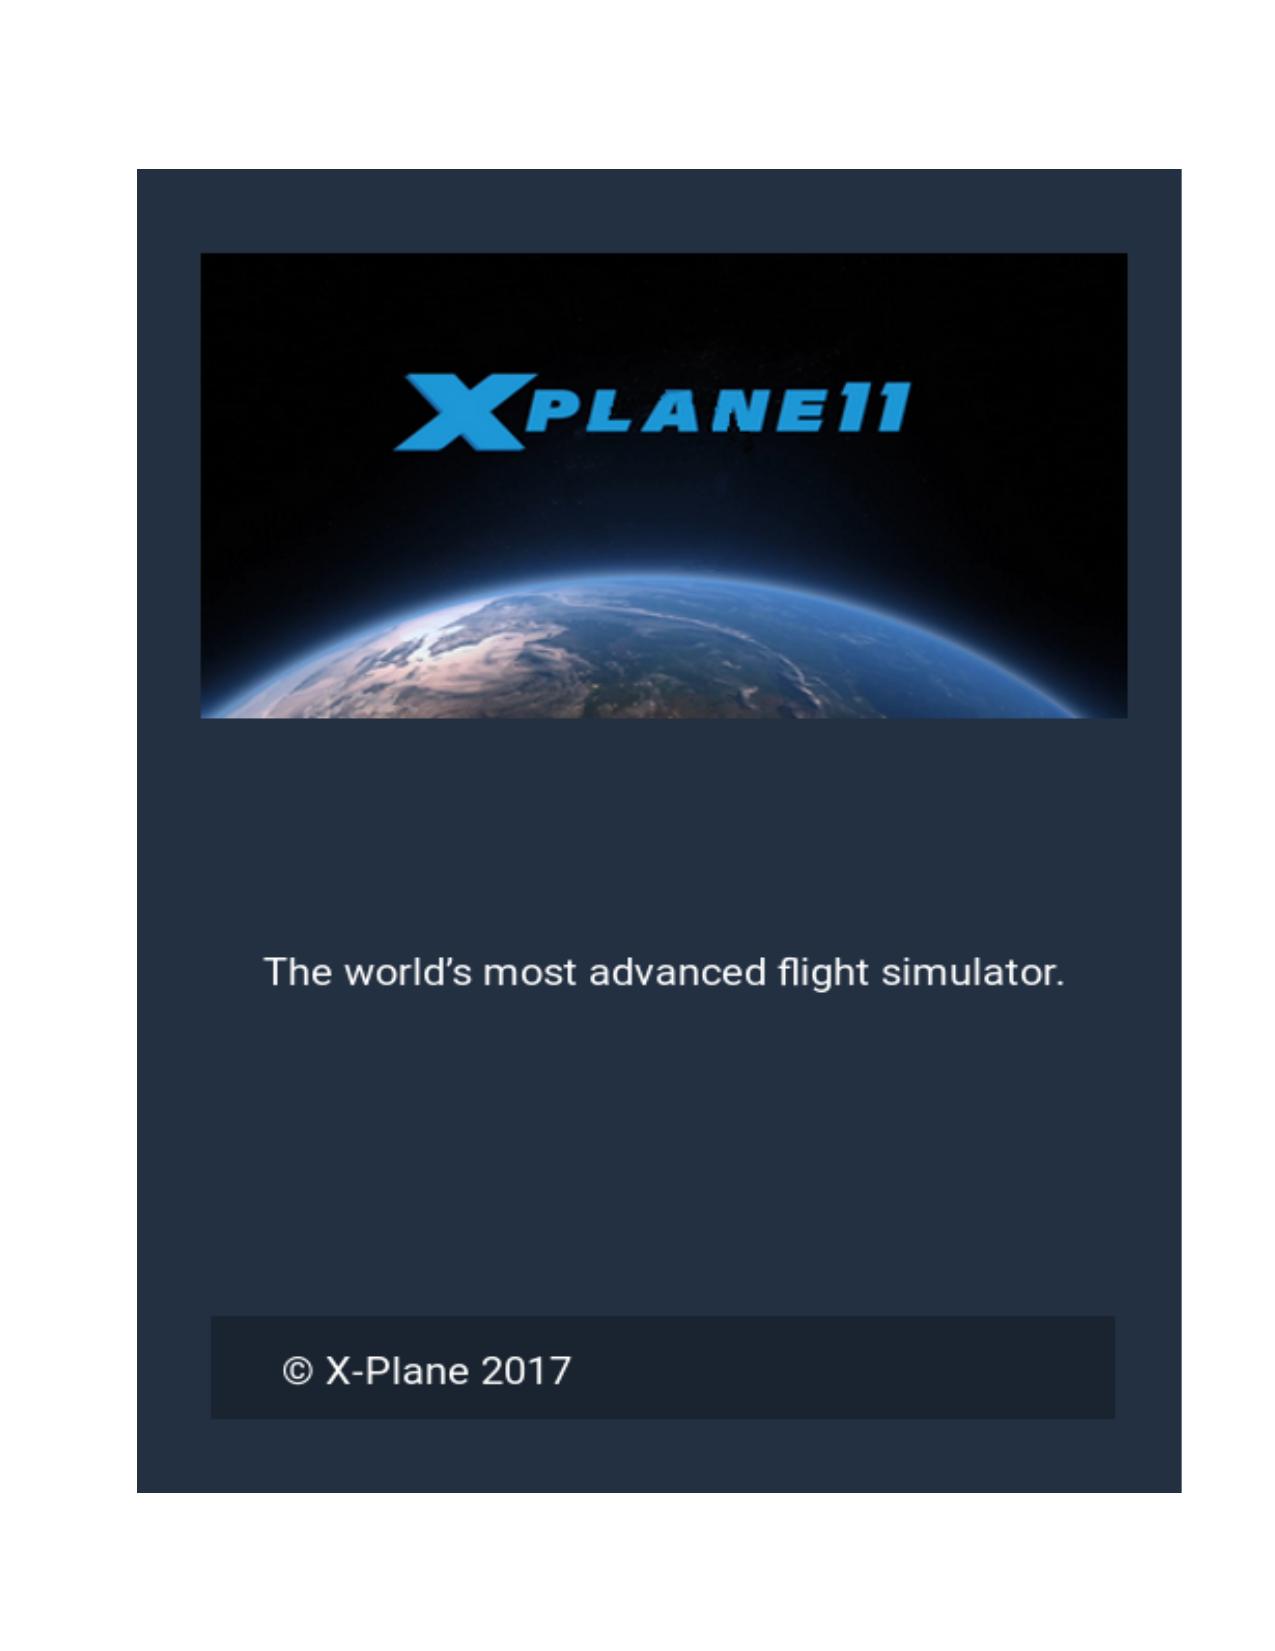 X-Plane 11 Desktop Manual | X-Plane com | The World`s Most